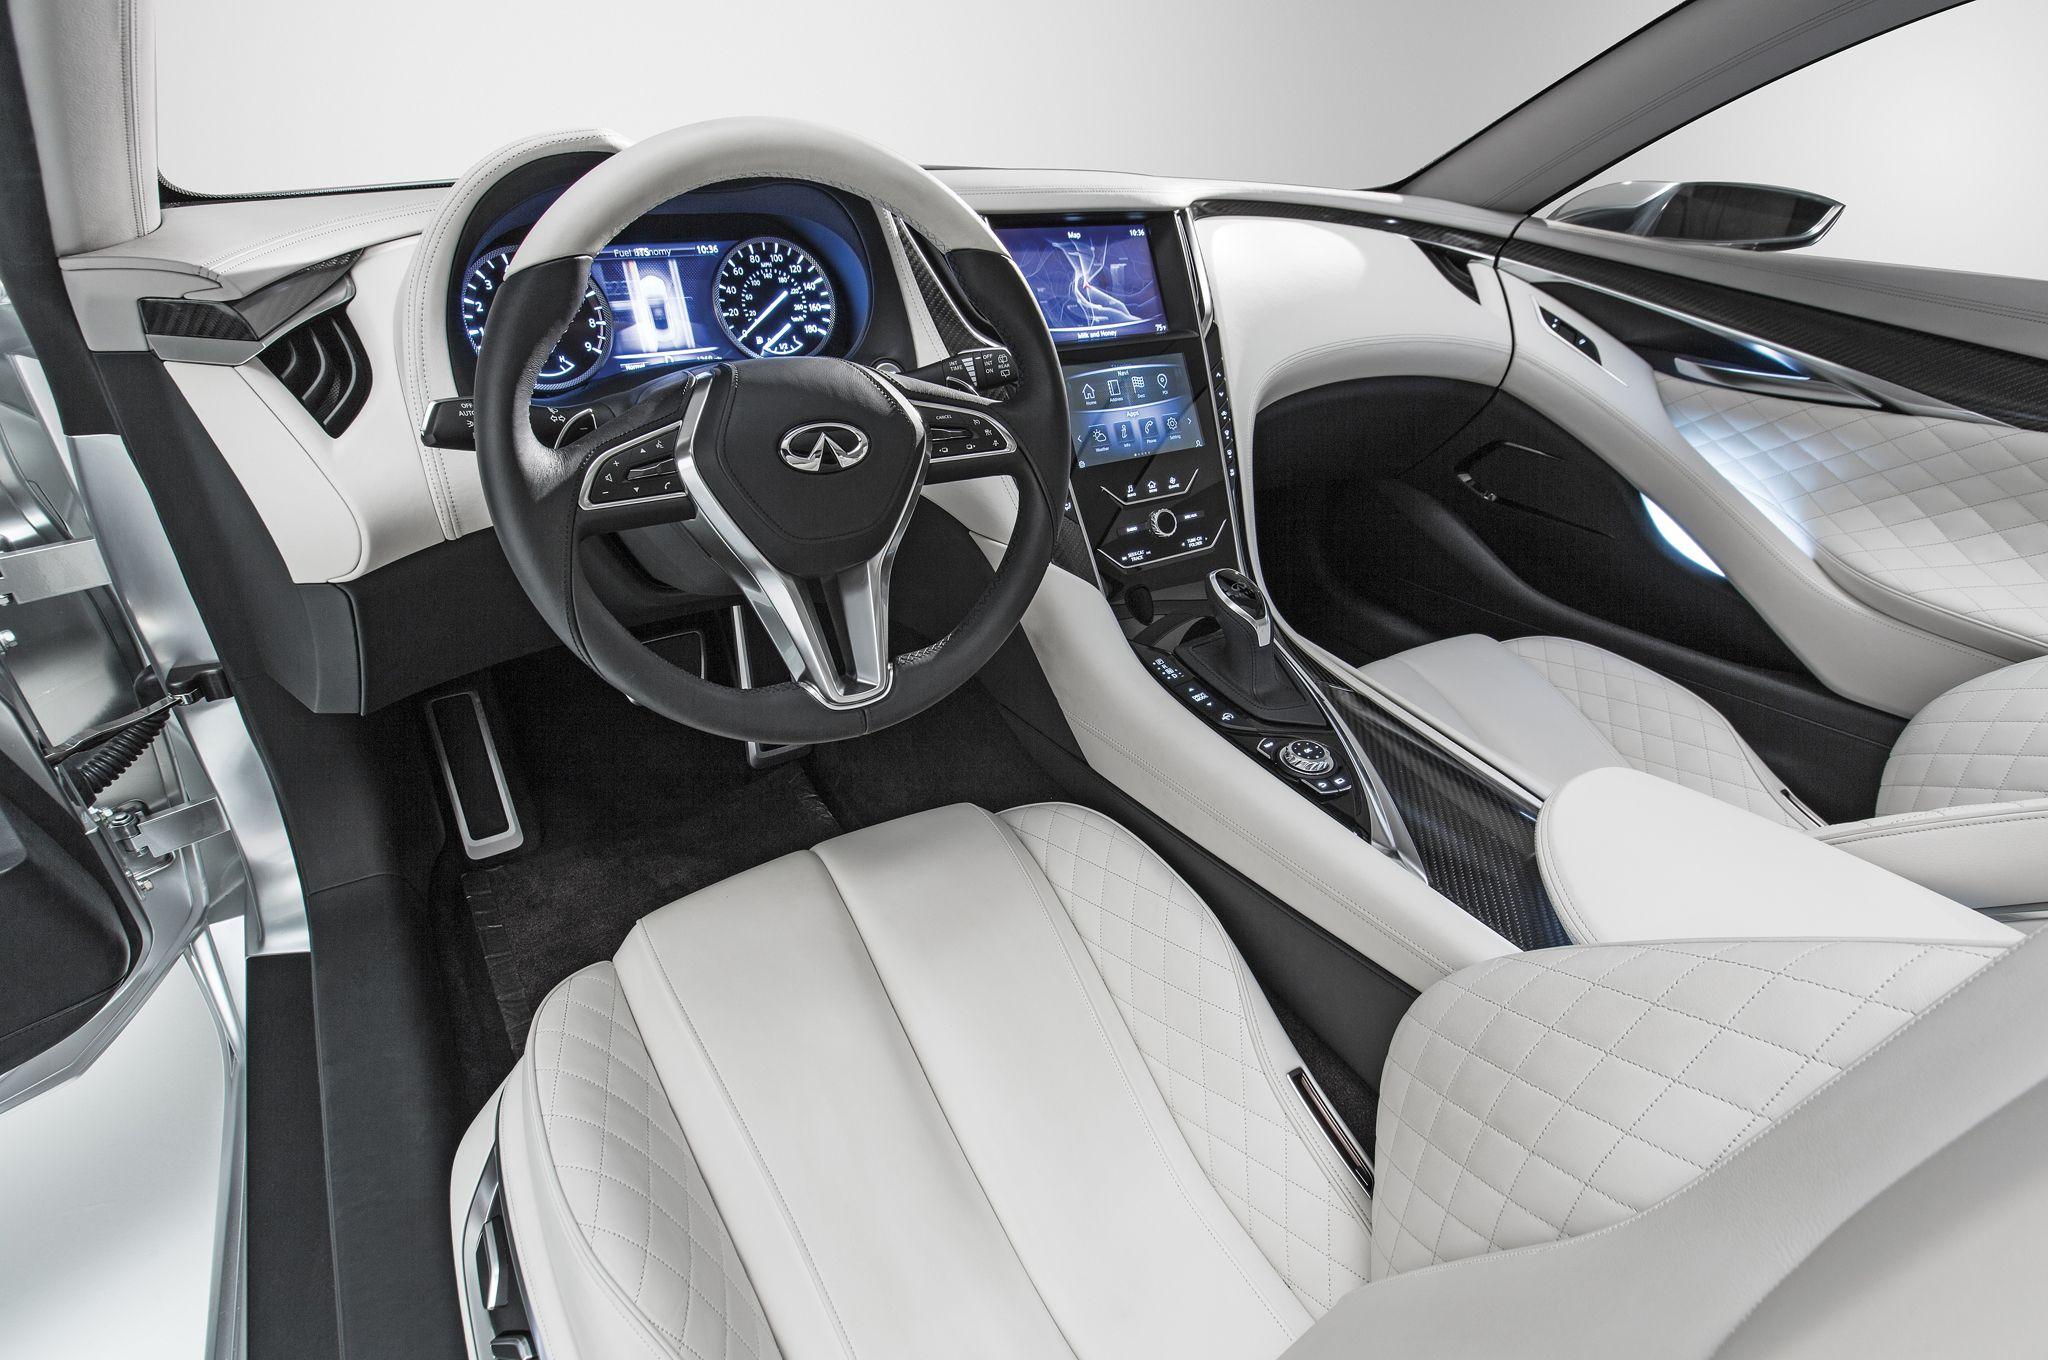 Infiniti Q60 Concept Interior Jpg 2048 1360 Detroit Auto Show Infiniti Coupe